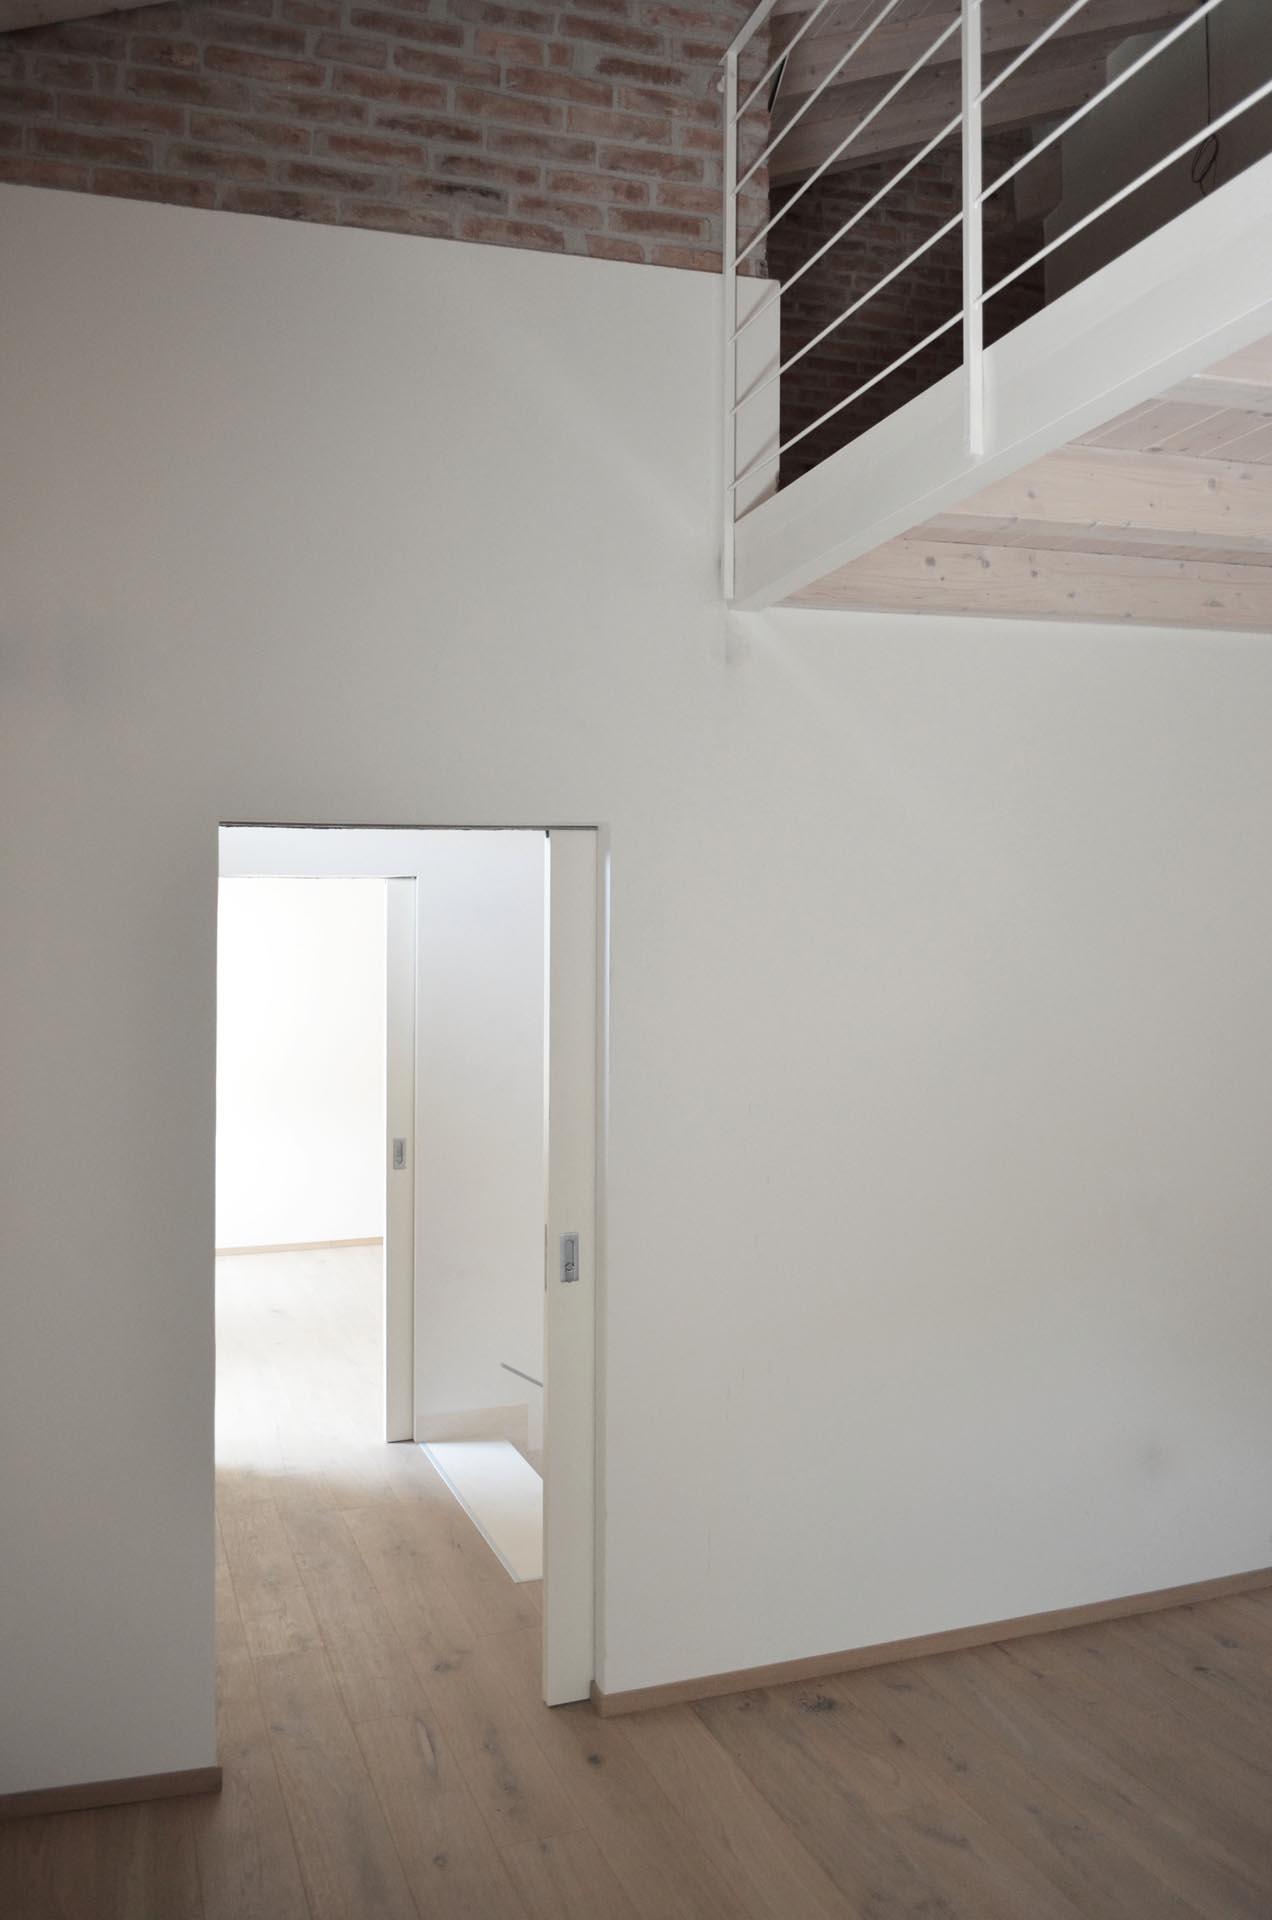 Porta scorrevole interno muro - Evoline3